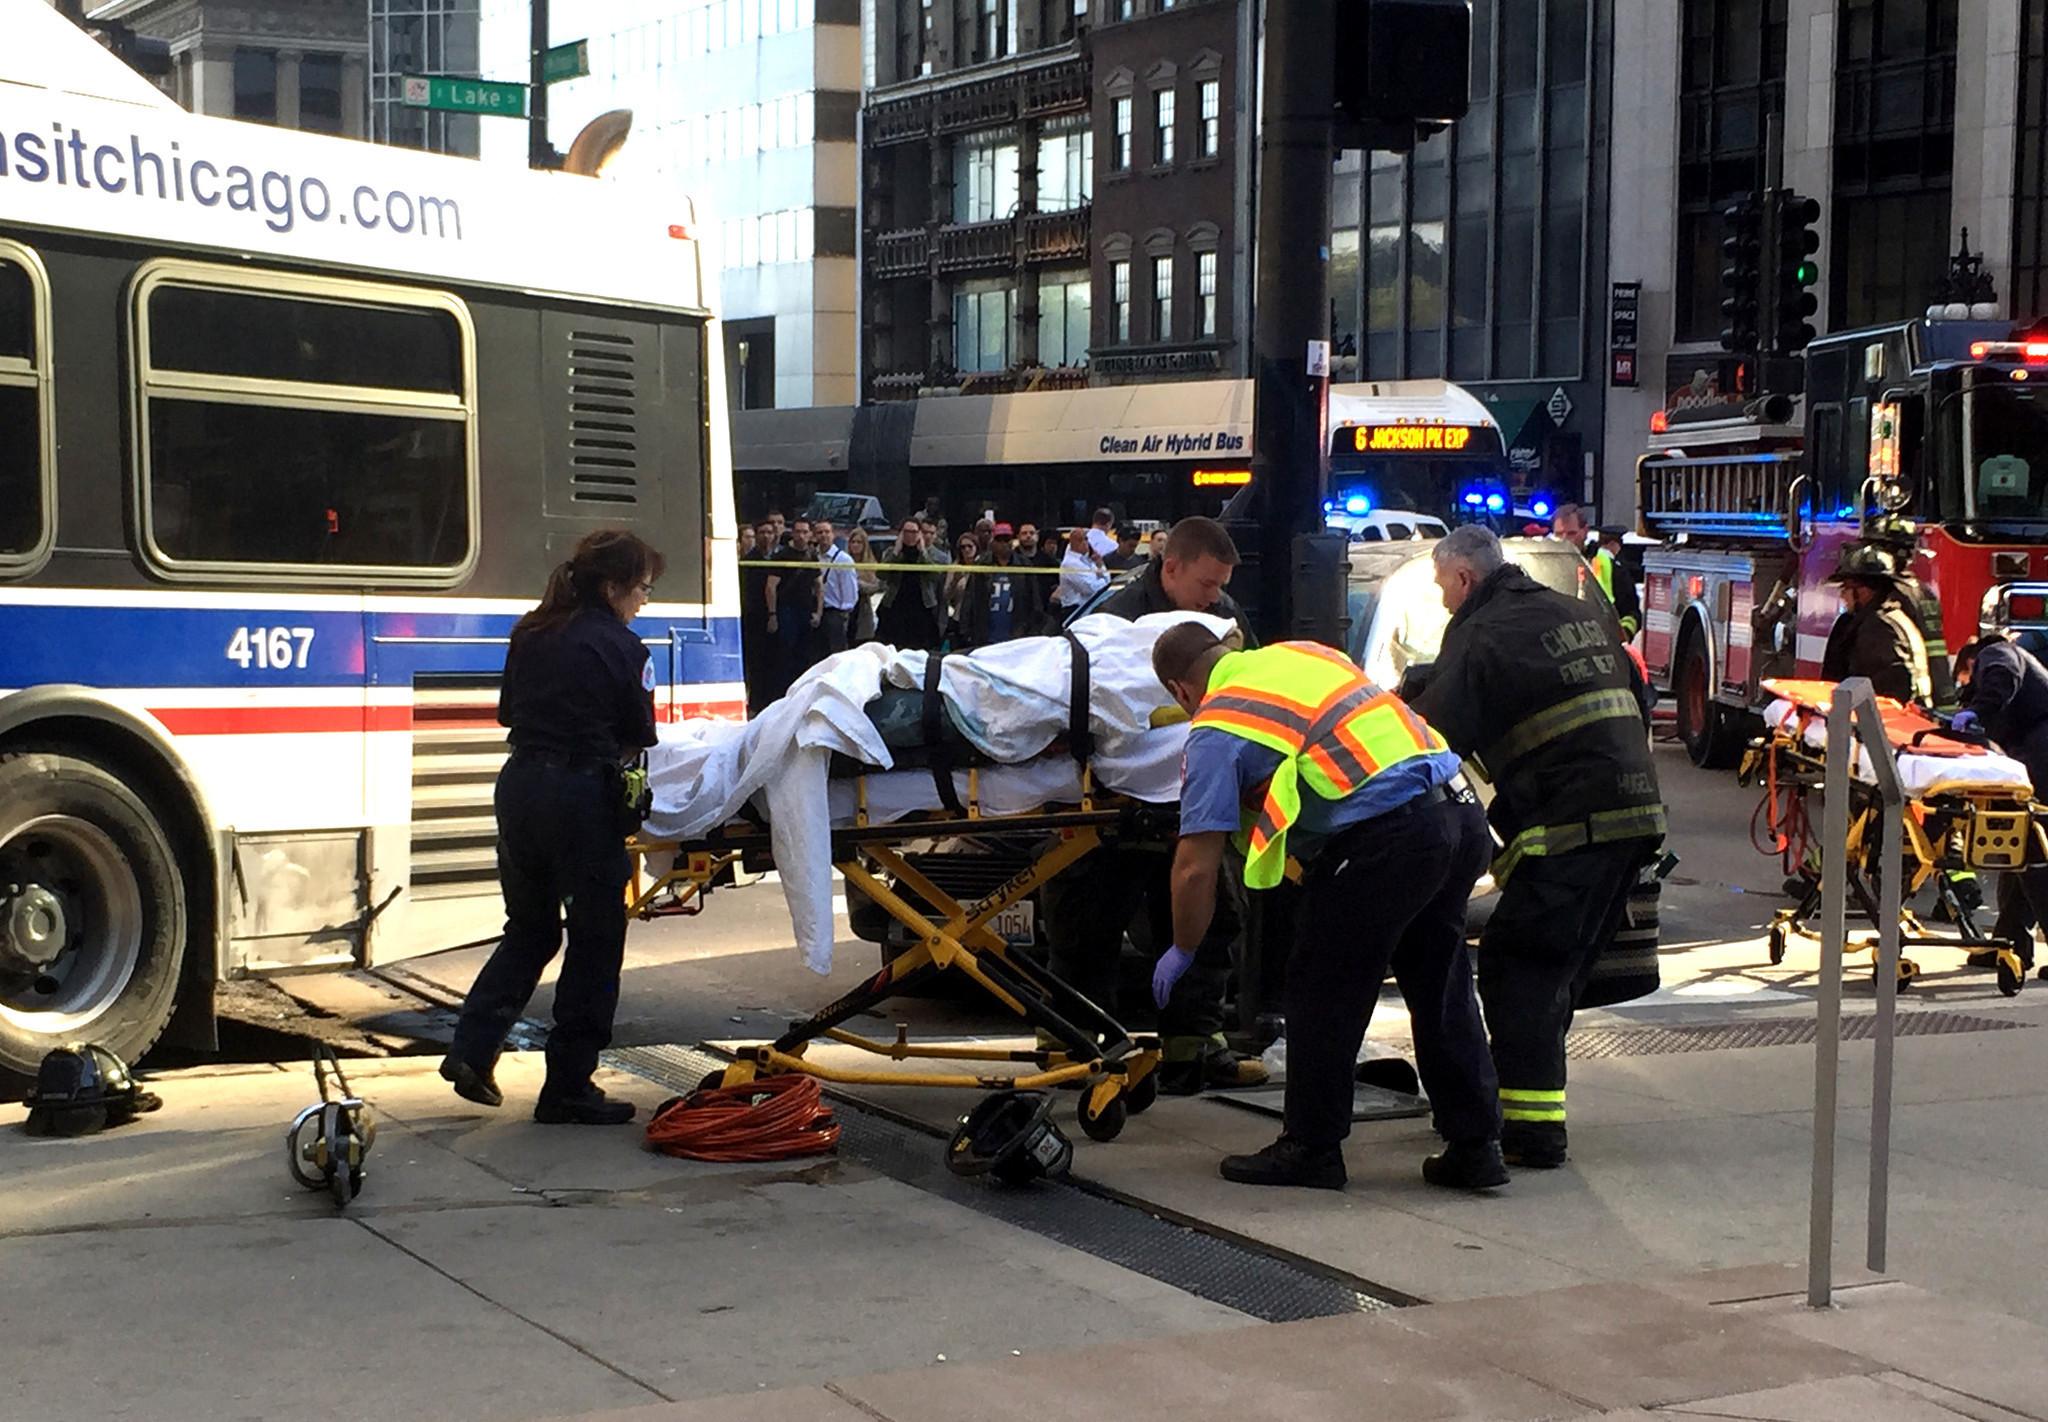 CTA To Overhaul Bus Driver Training After Fatal Crash